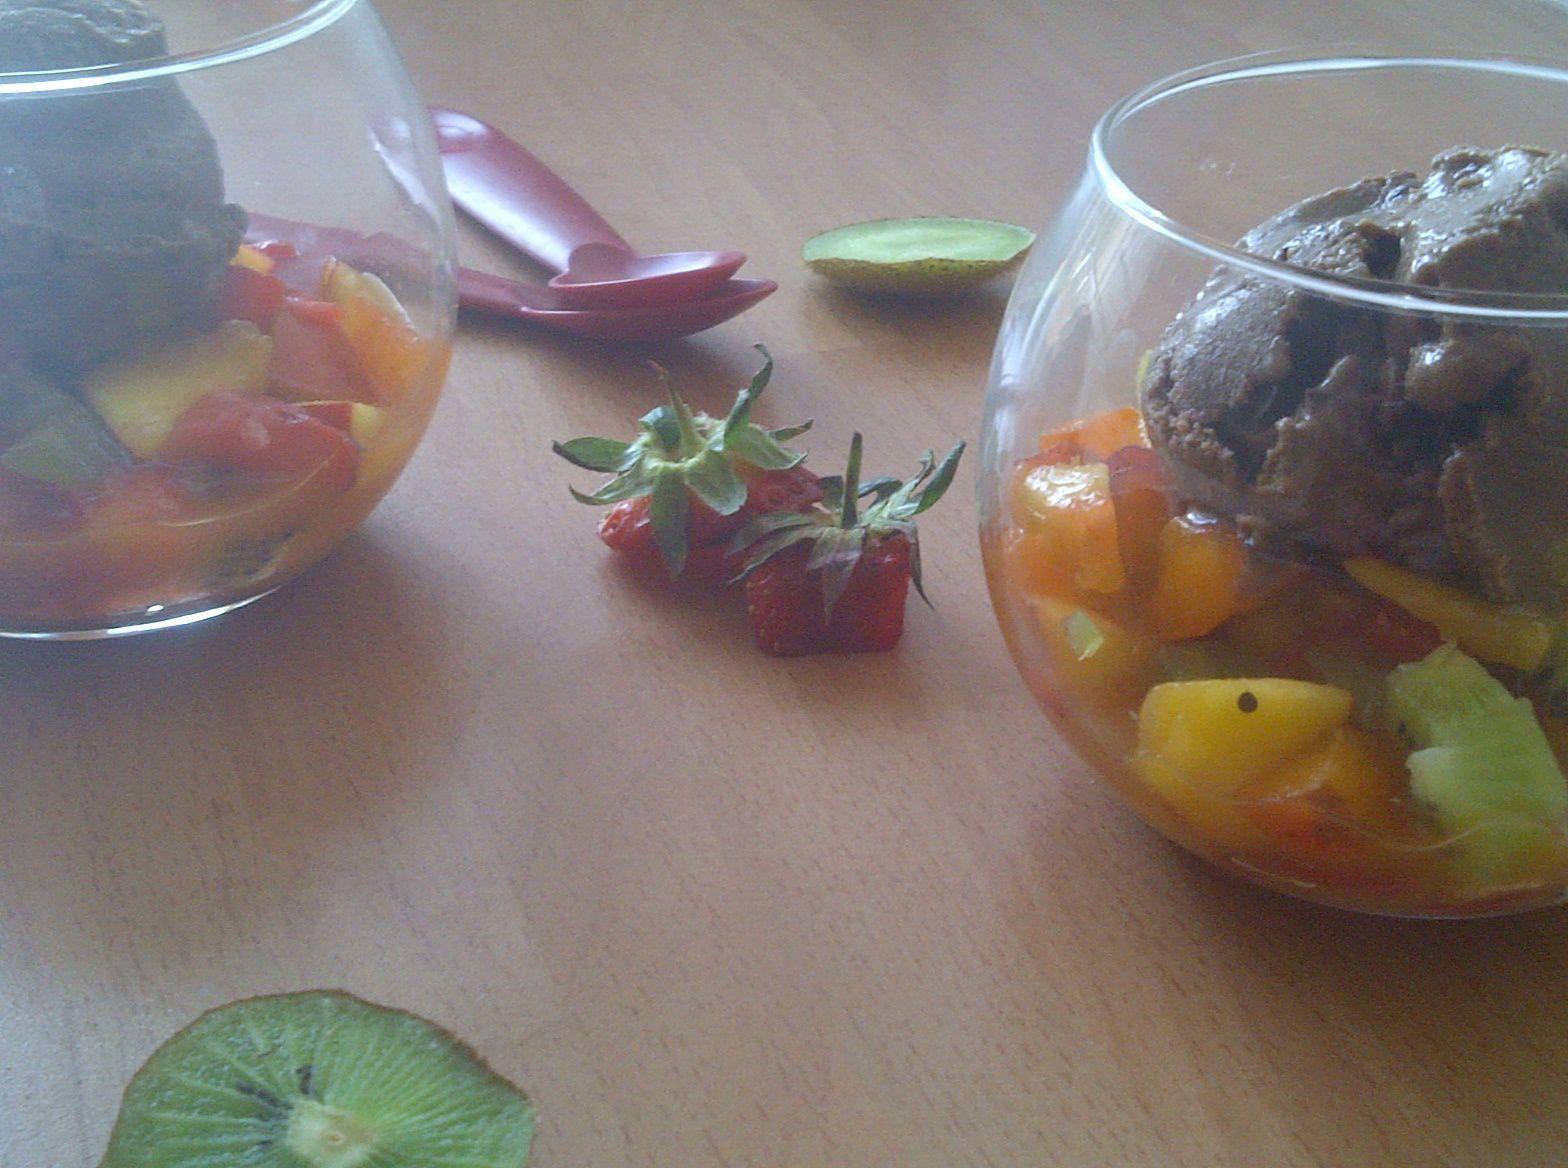 Salade de fruits frais et glace au chocolat